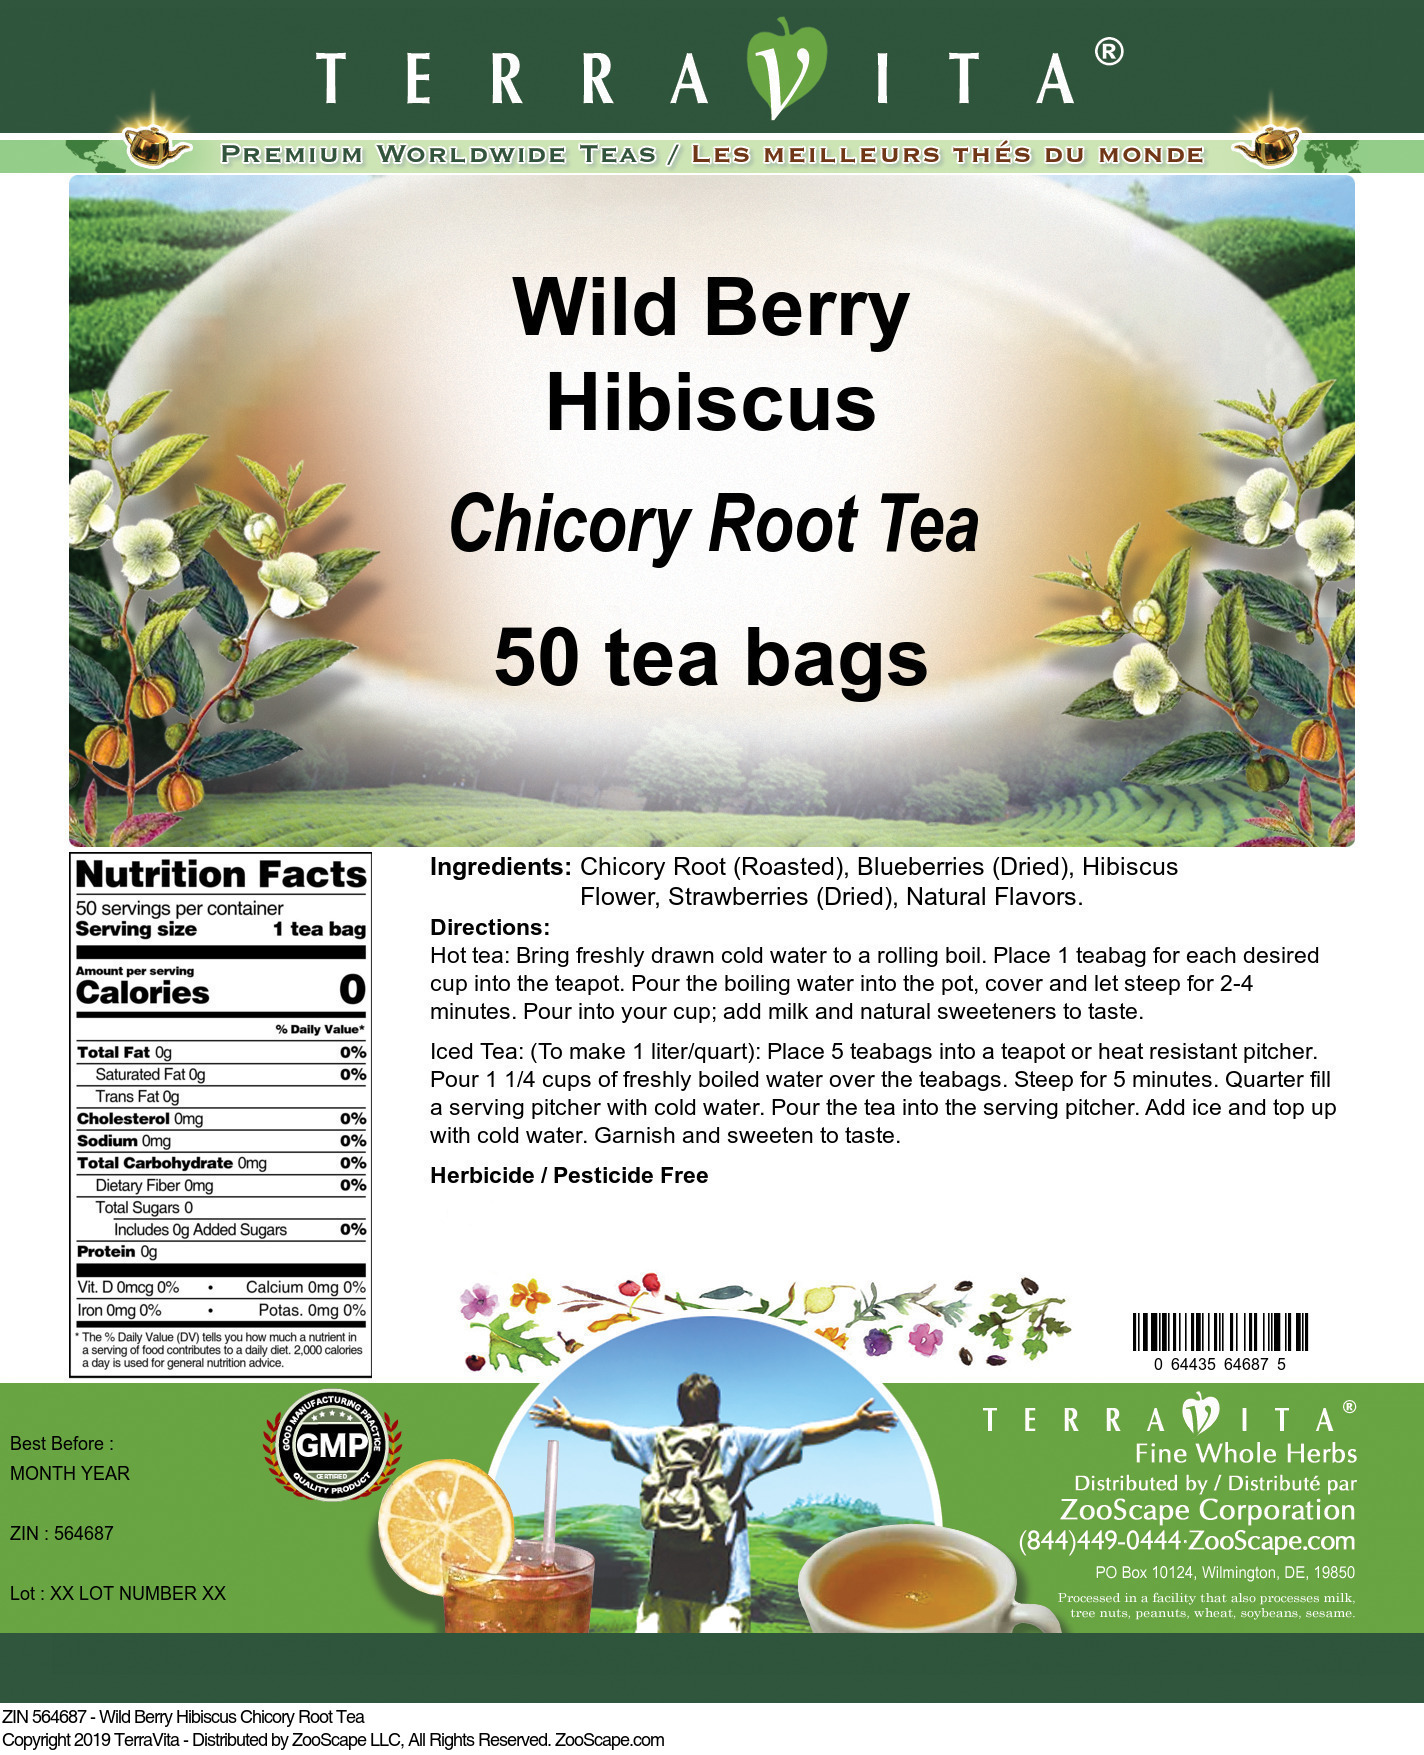 Wild Berry Hibiscus Chicory Root Tea